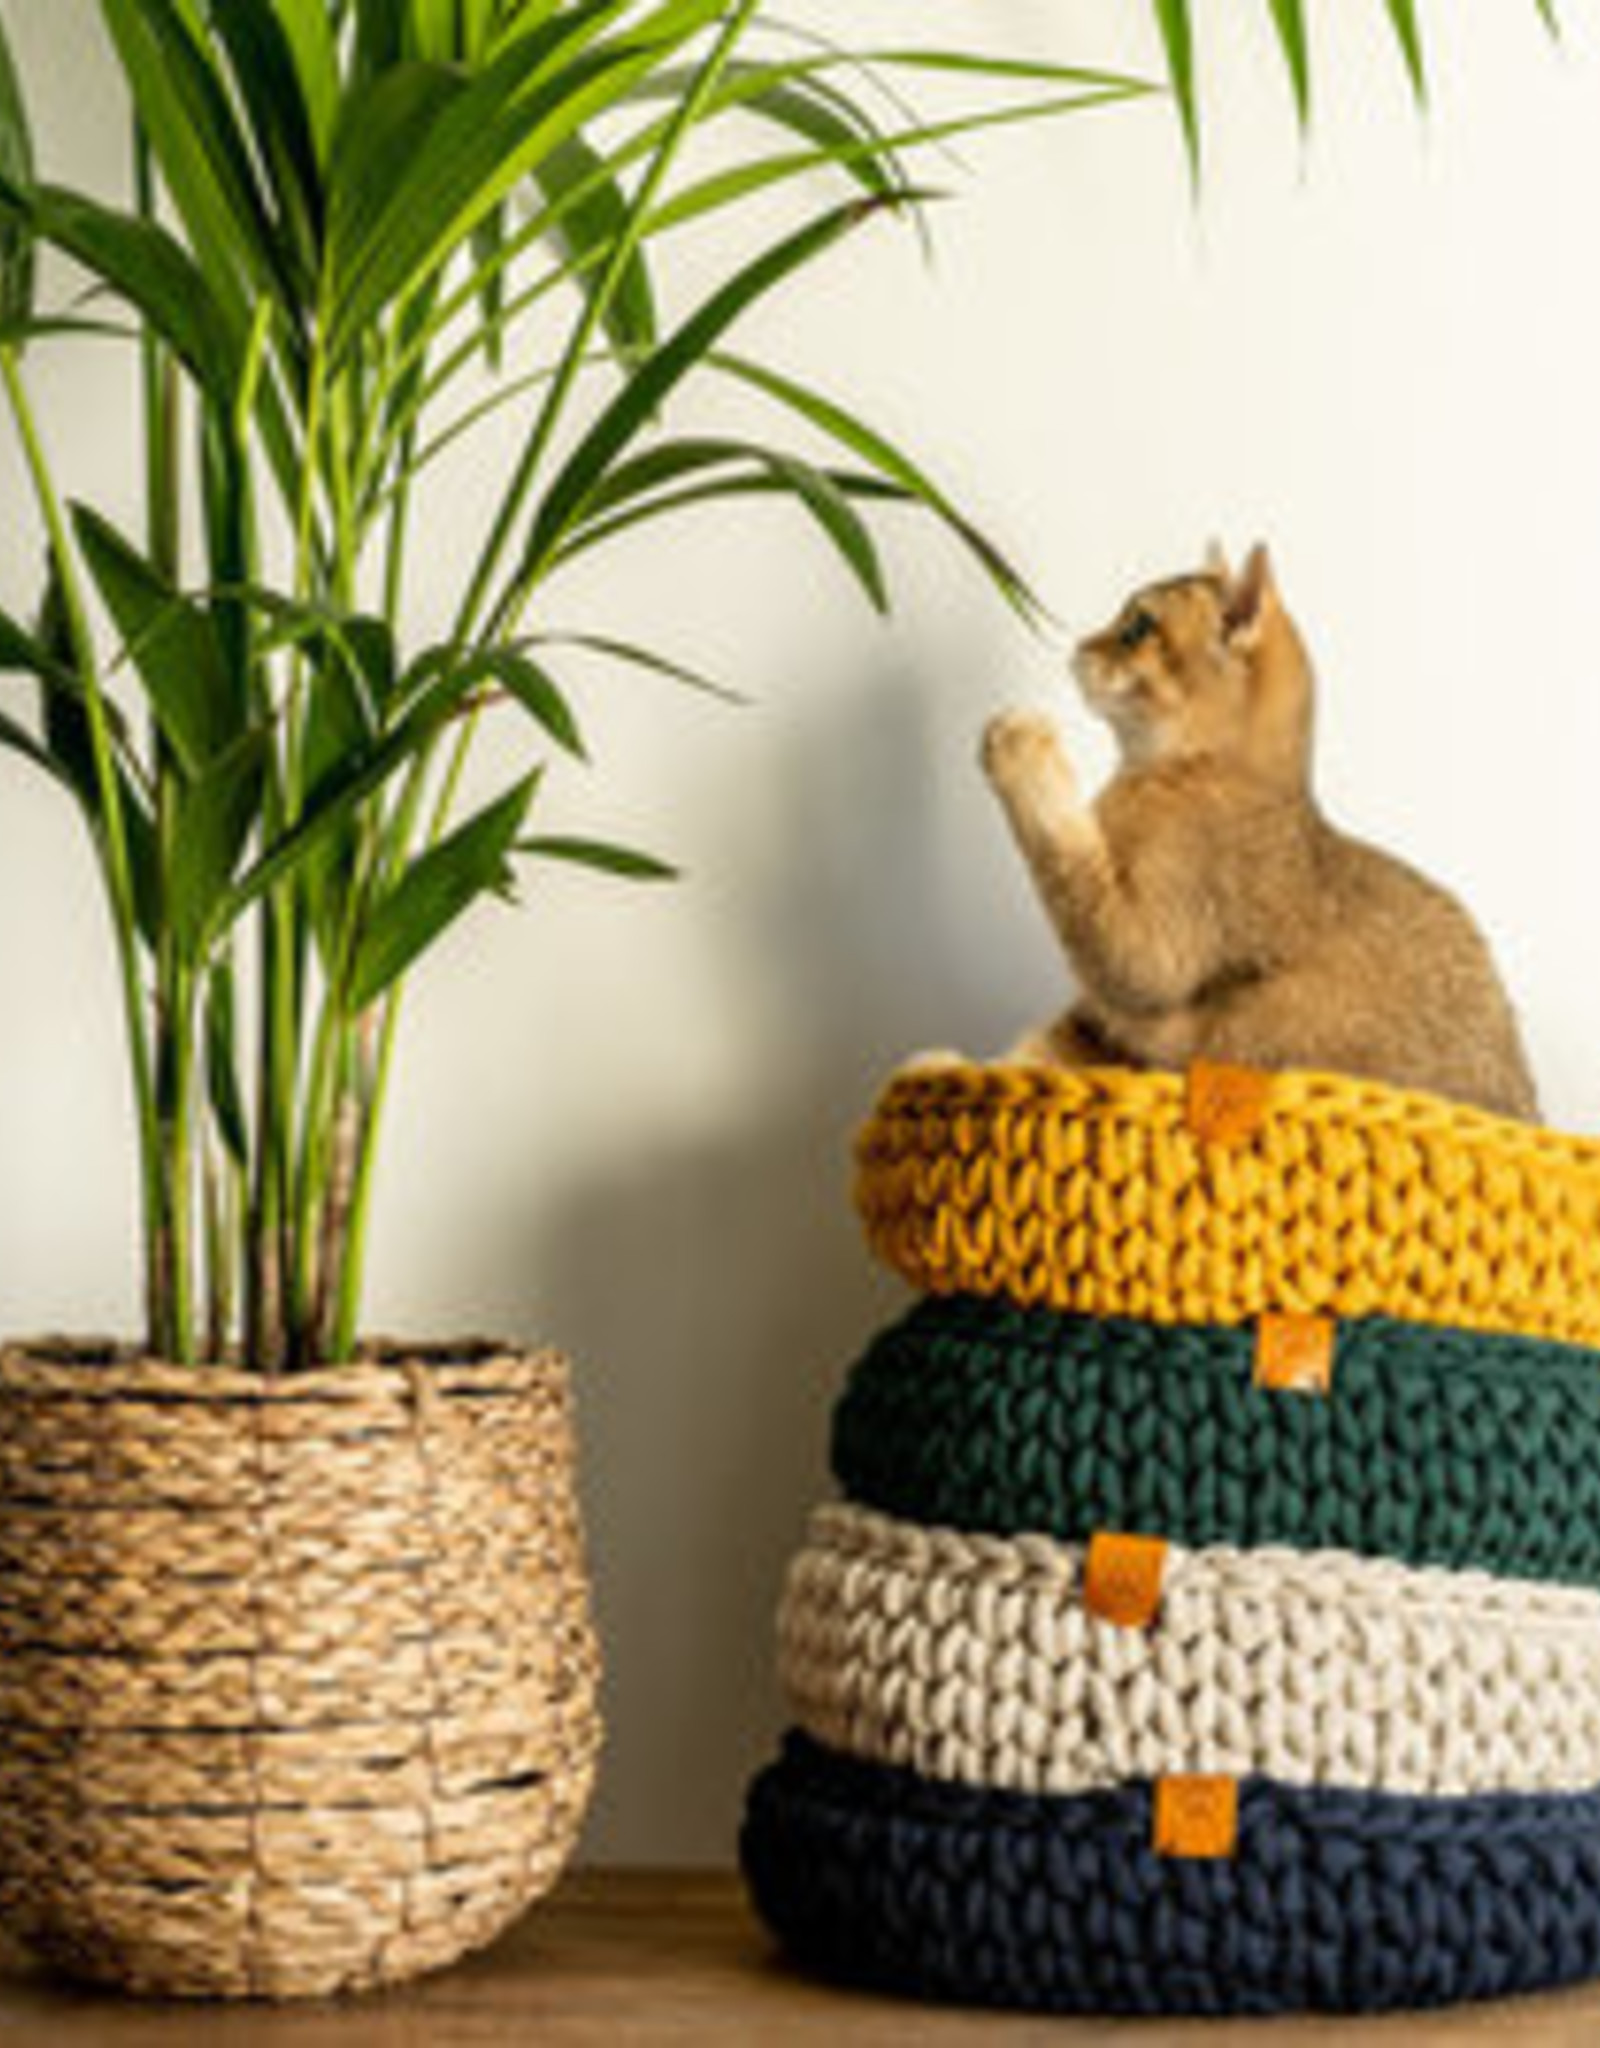 Sunny Baskets Sunny Baskets Handgehaakte kattenmand - Donkerblauw M